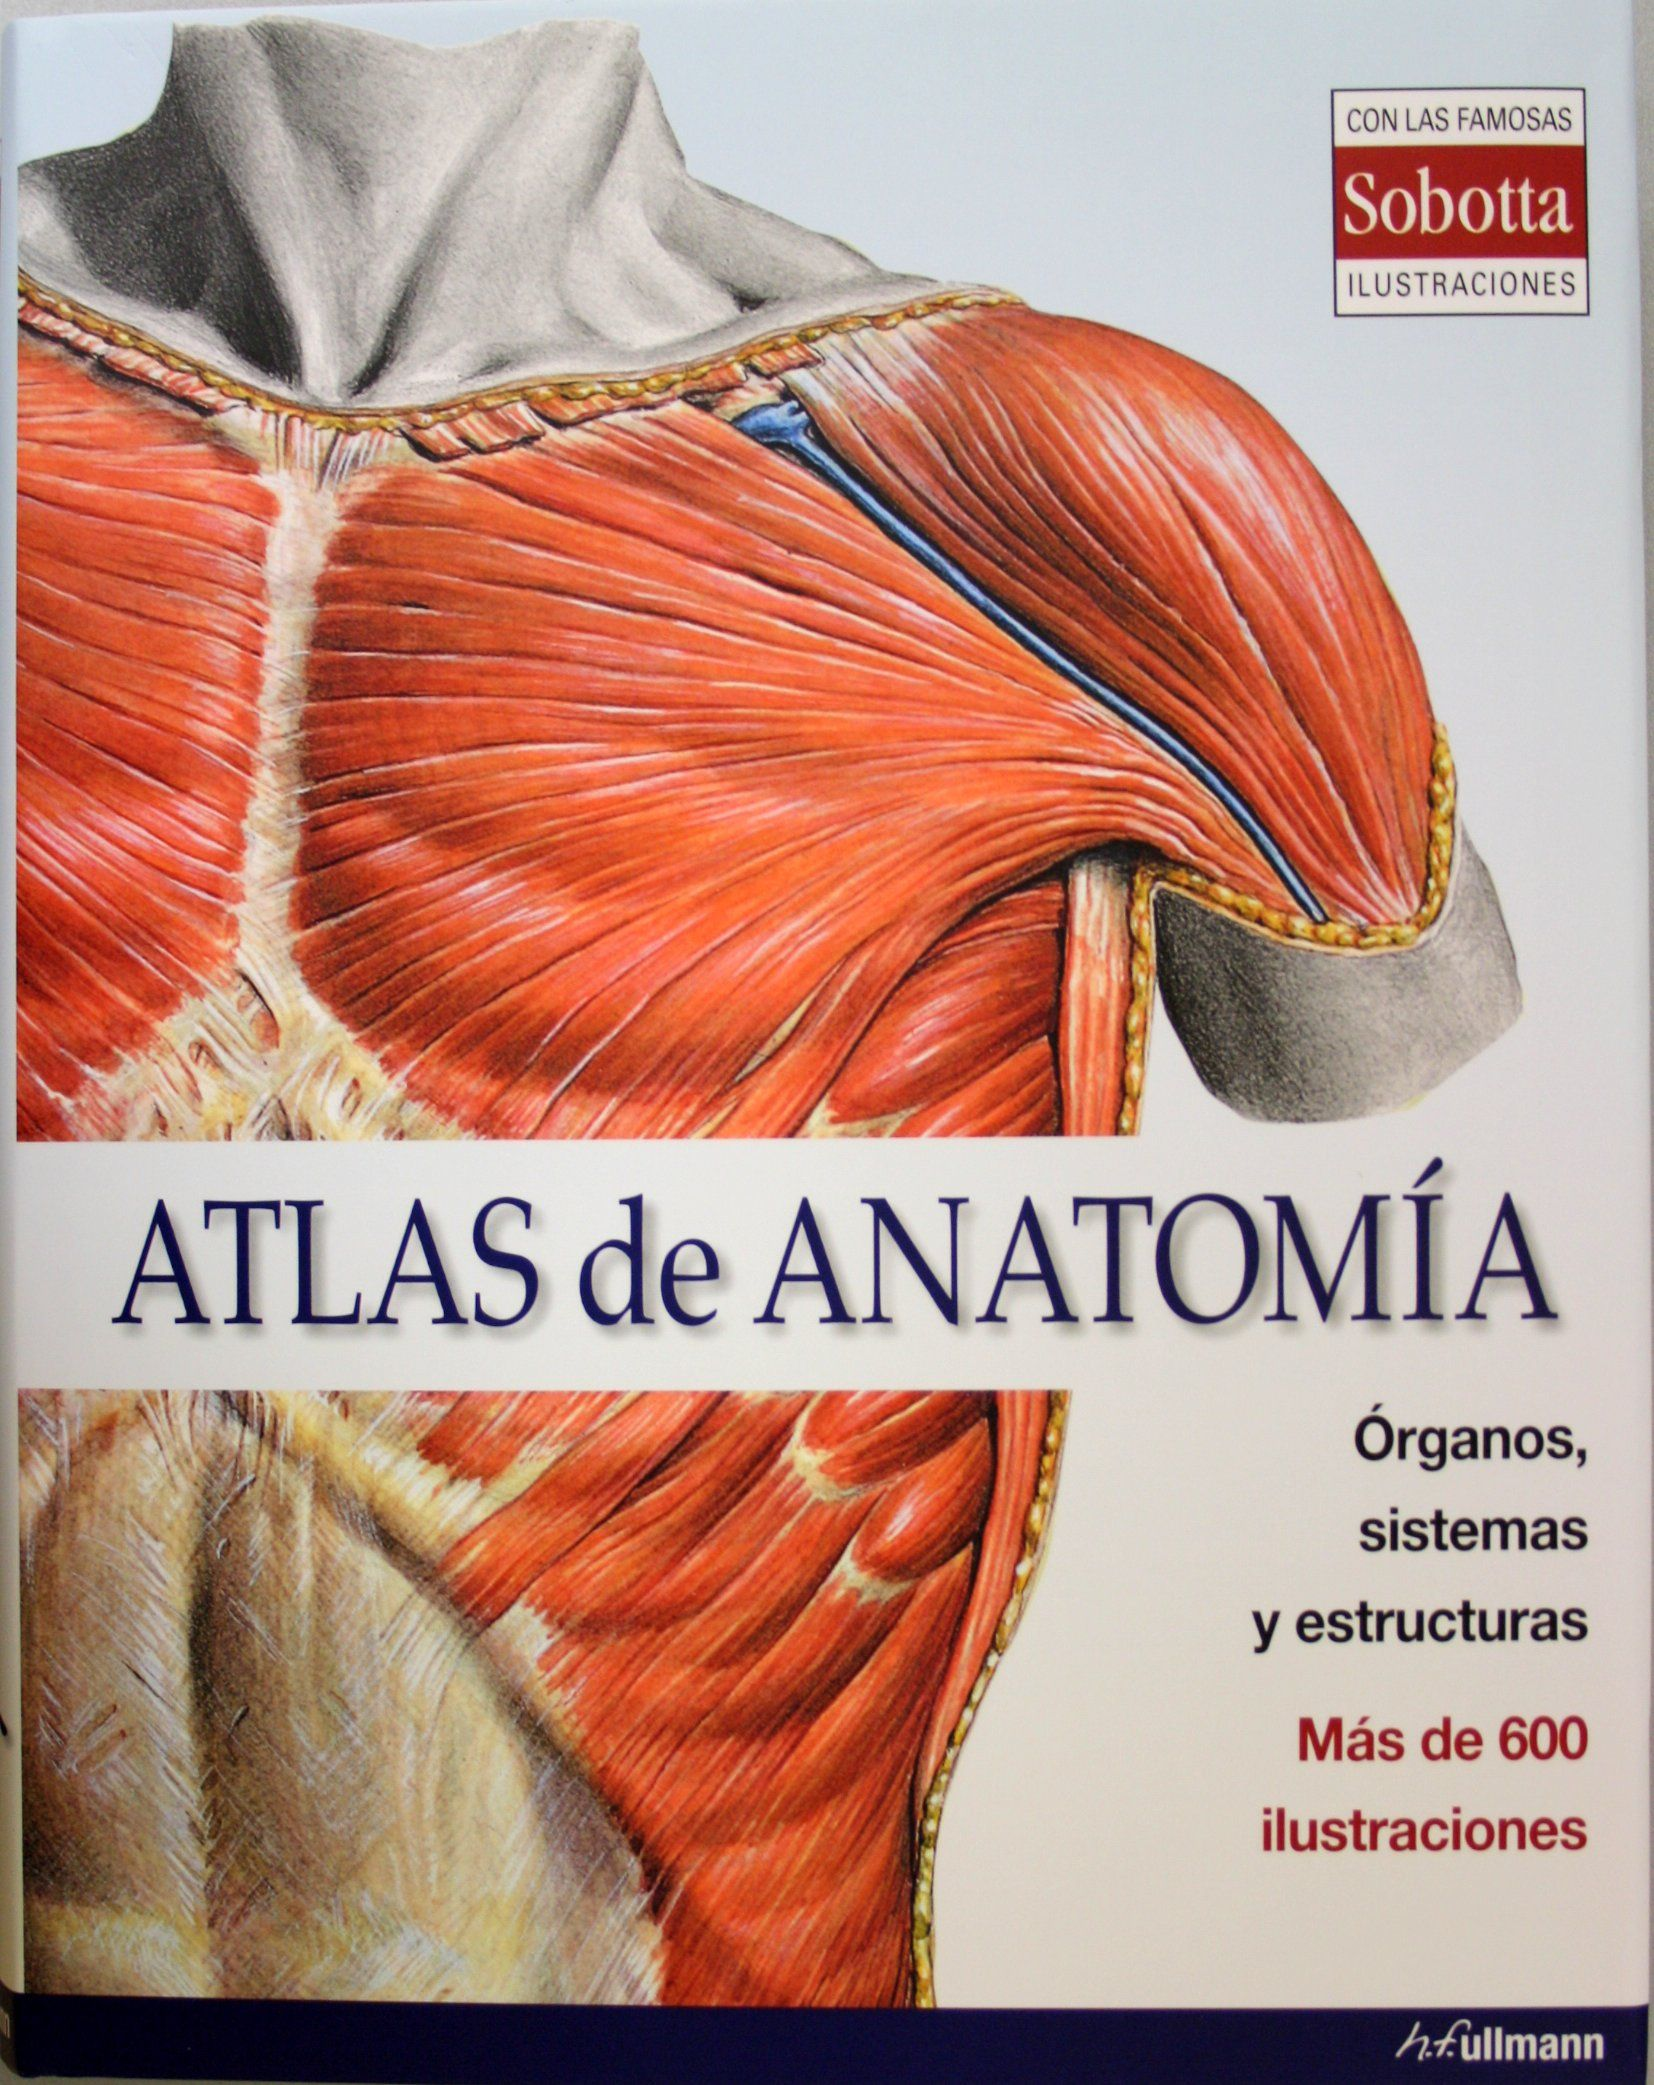 Atlas de anatomía. +info: http://www.ullmann-publishing.com/es ...